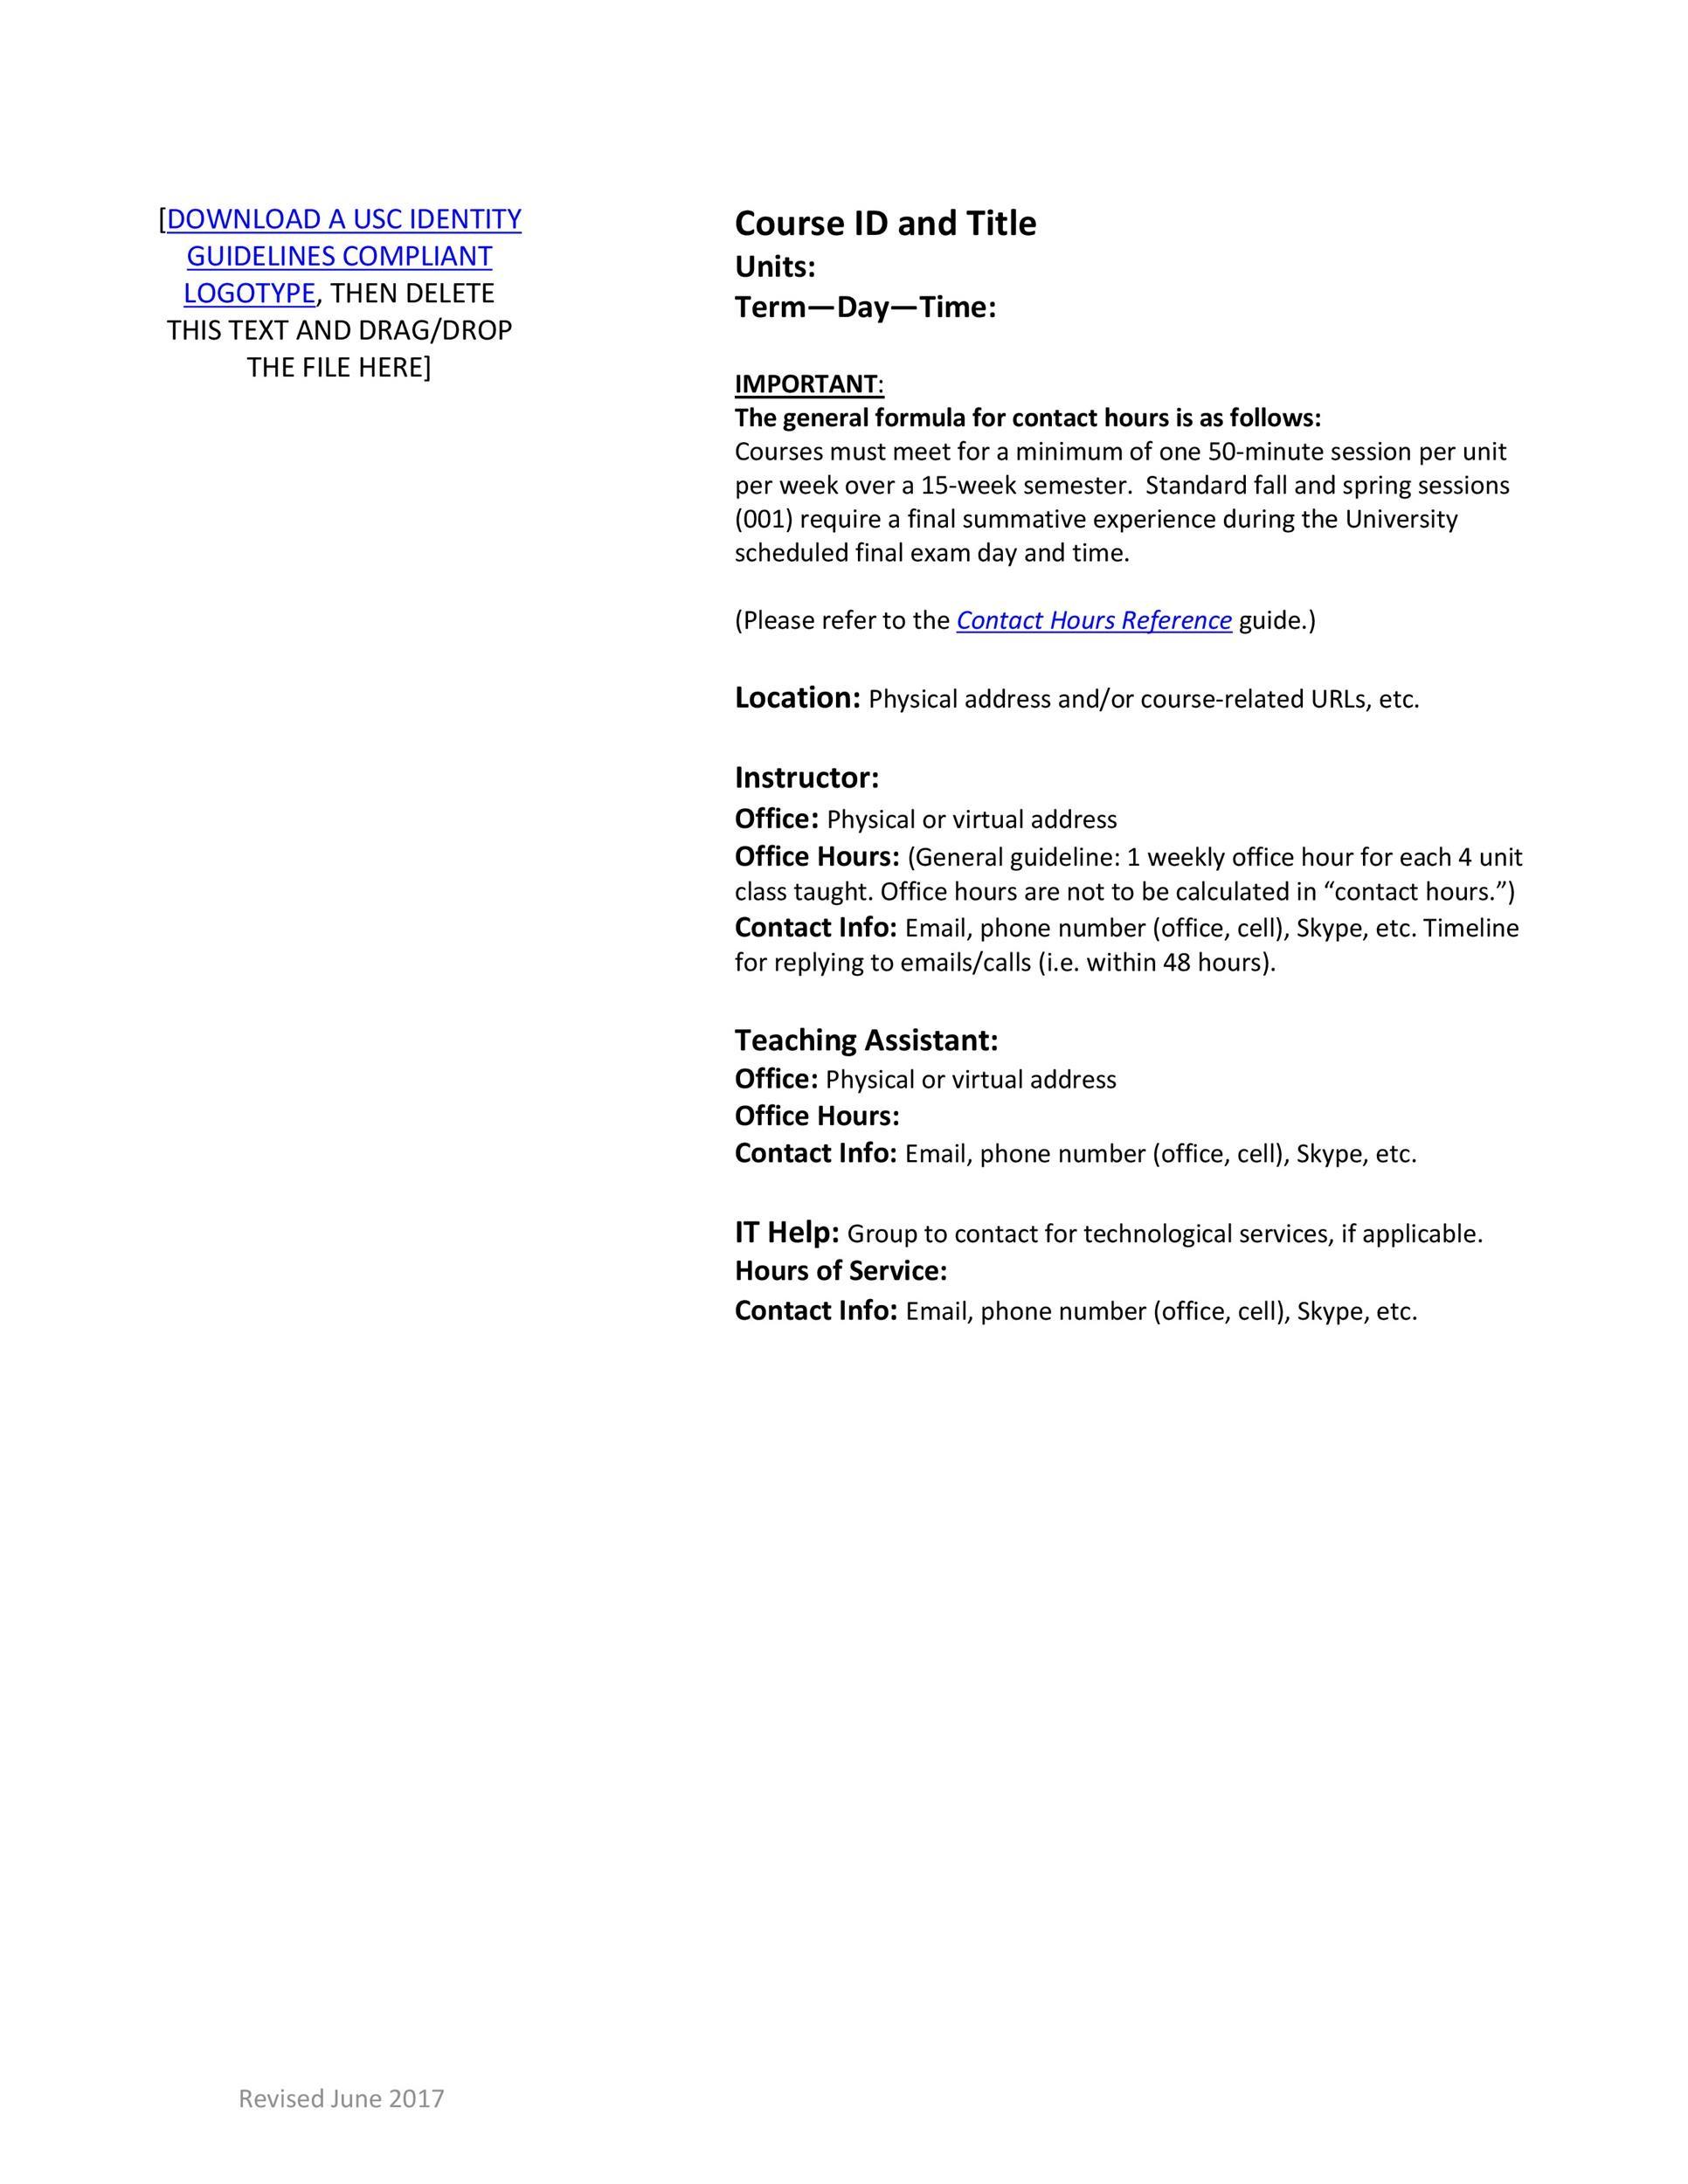 Free sylabus template 42